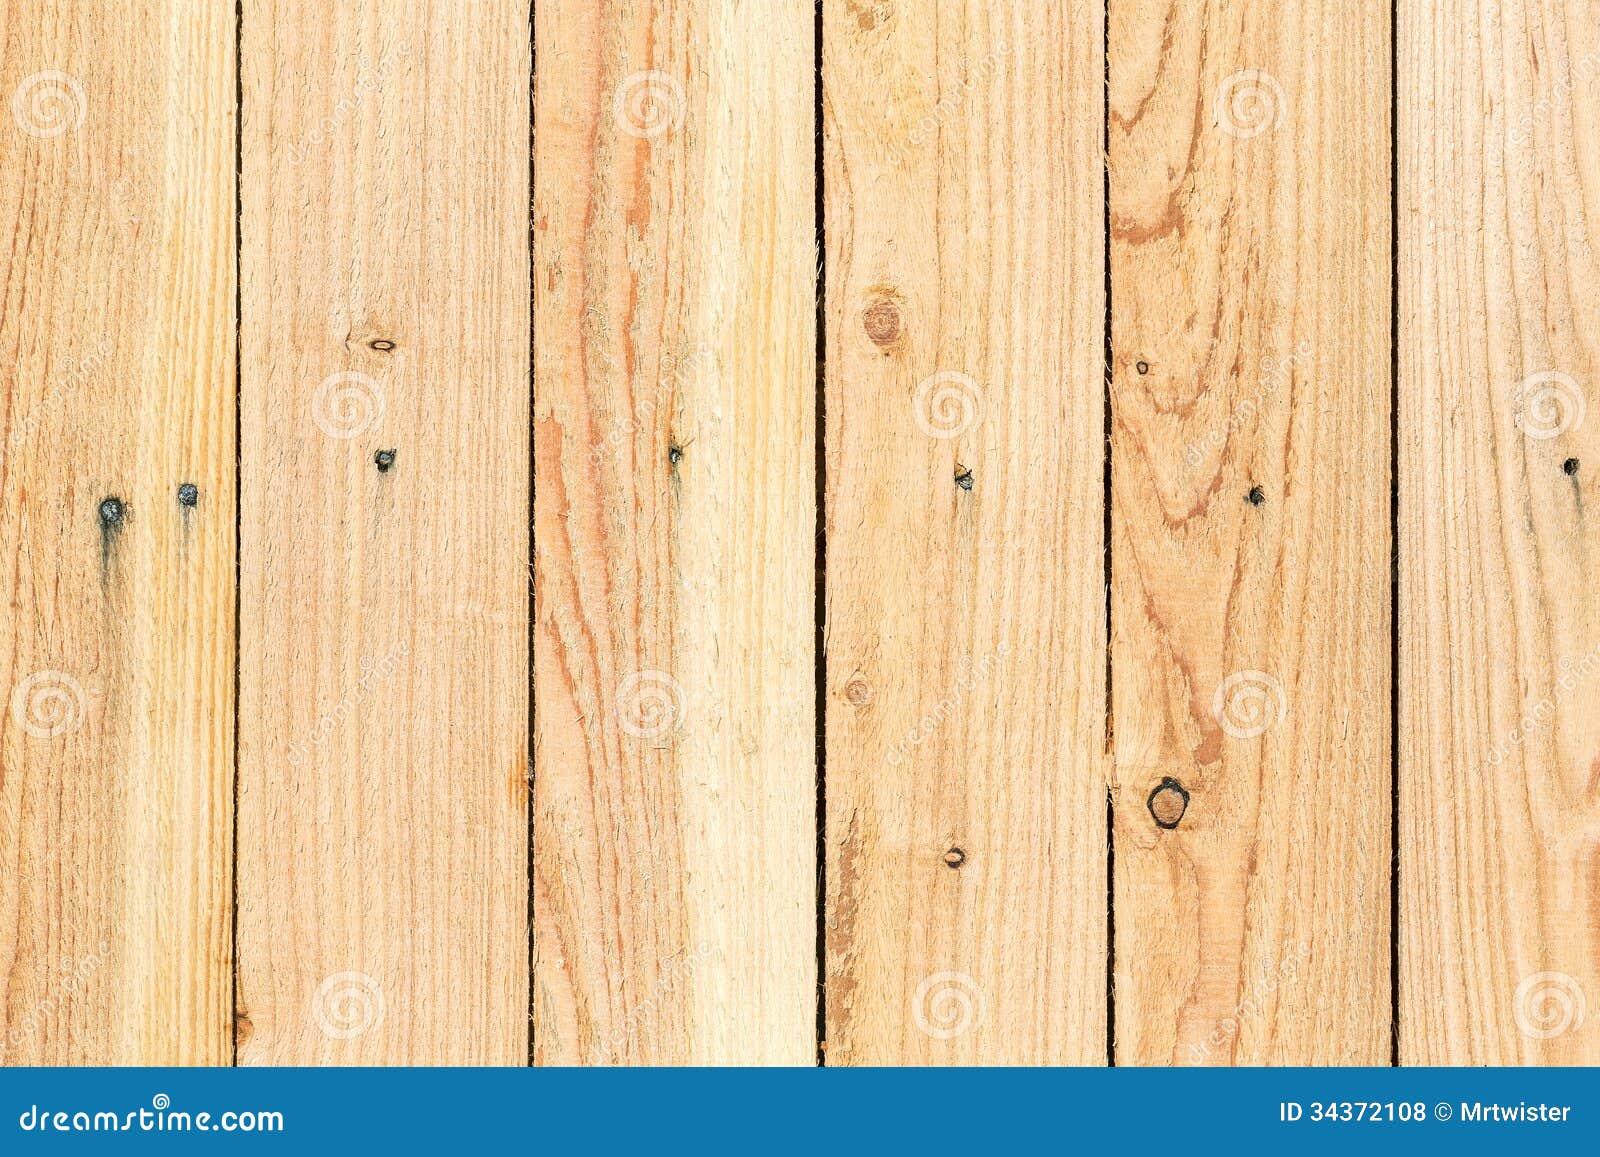 Pine Wood Fence Royalty Free Stock Photos Image 34372108